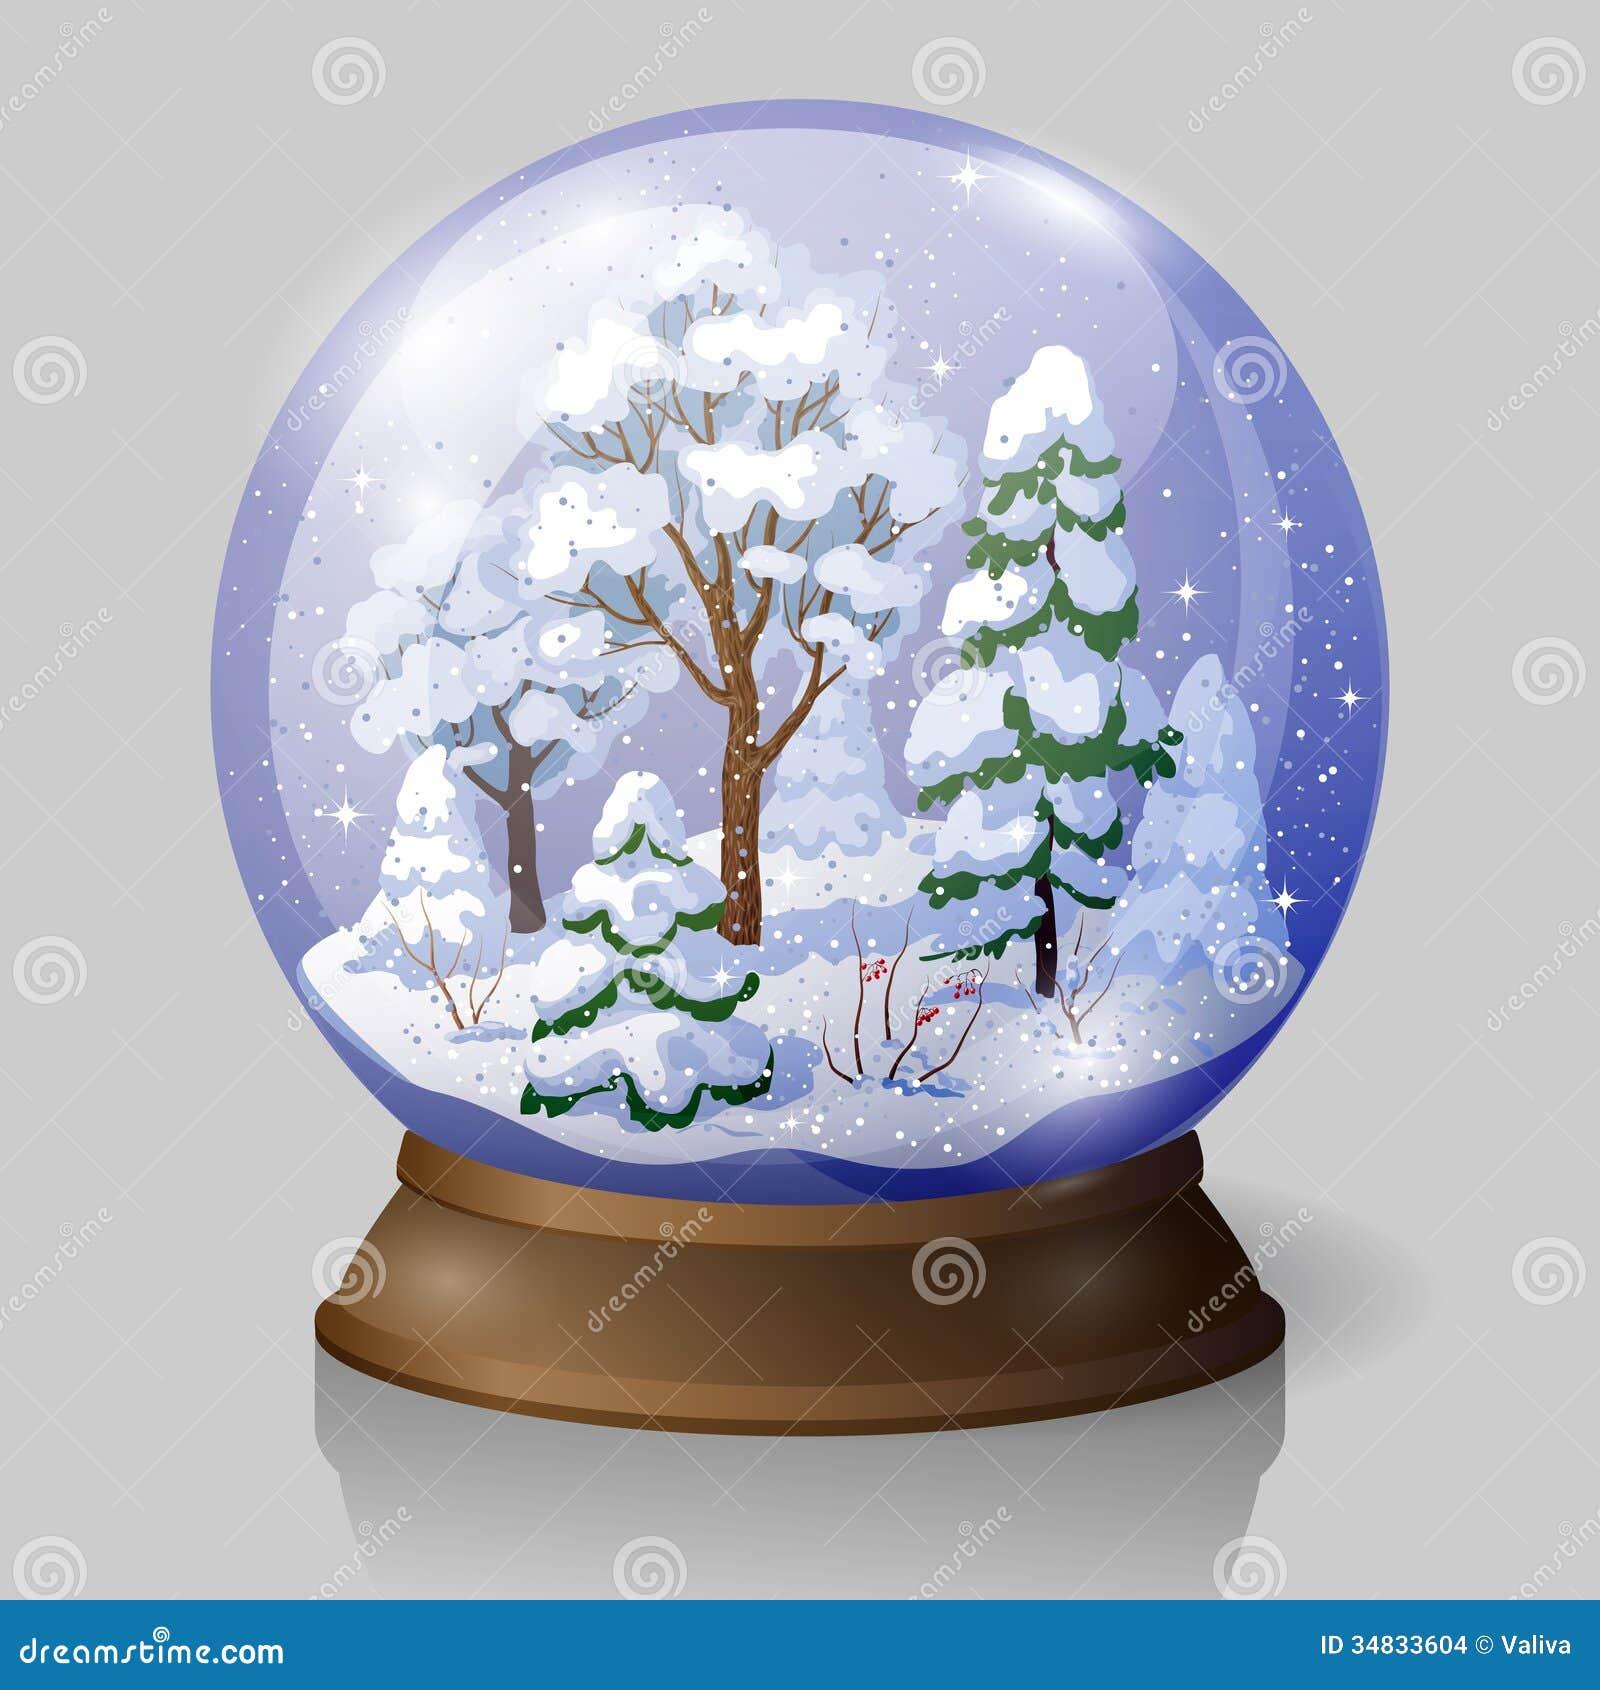 snow falling animated gif